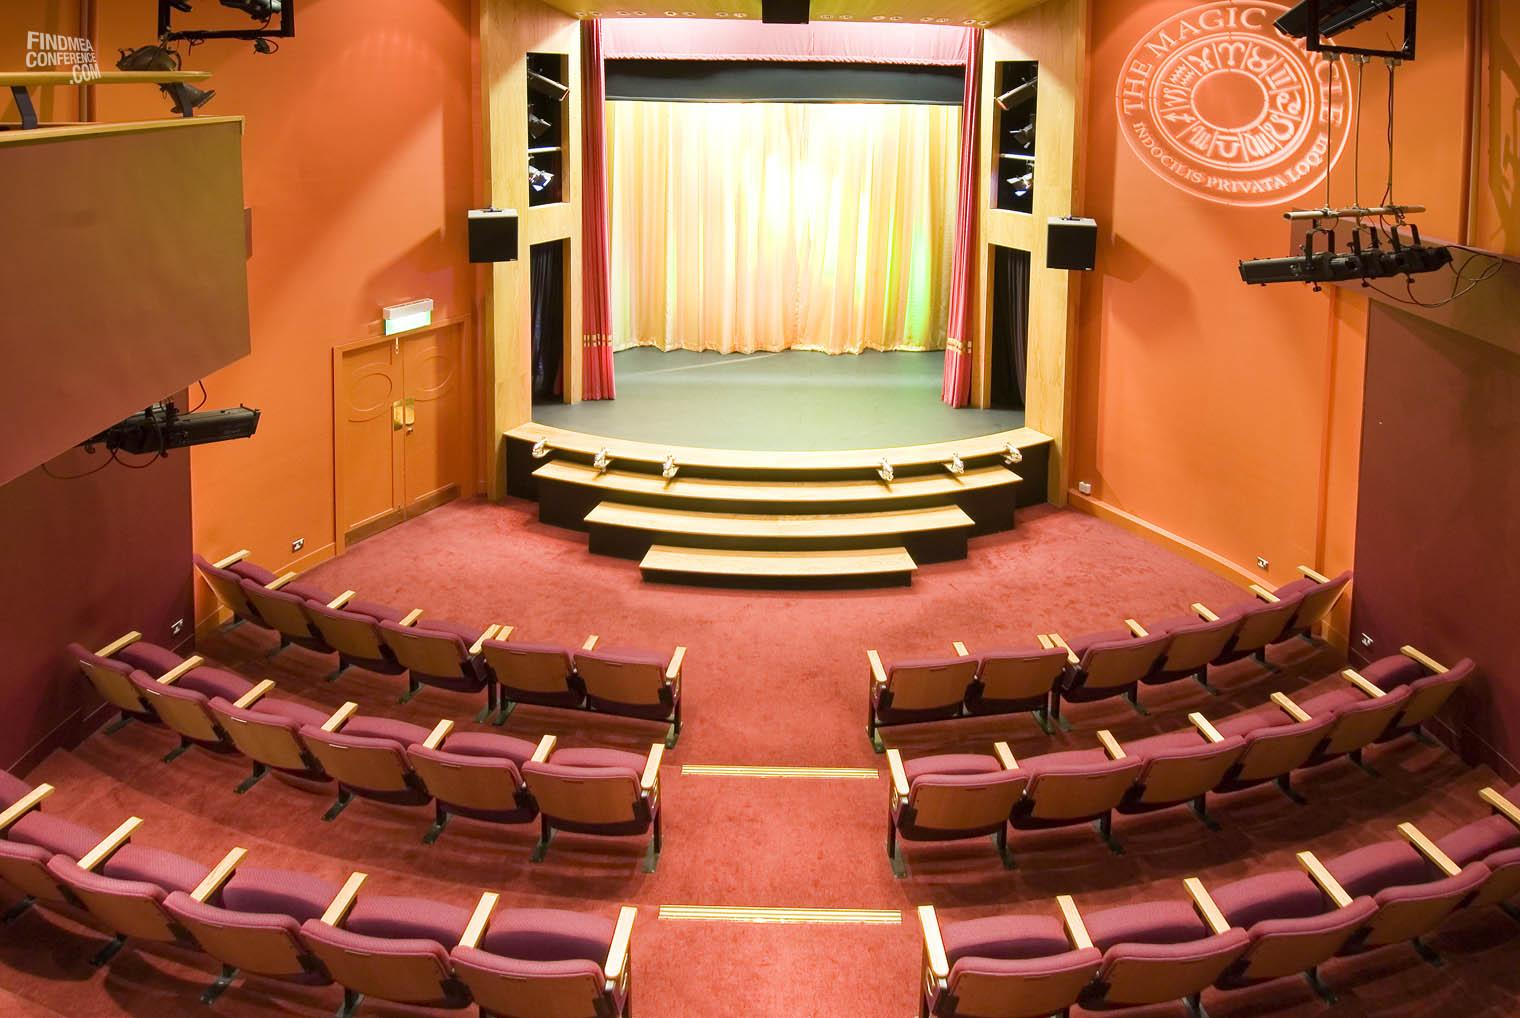 Book Theatre At The Magic Circle Tagvenue